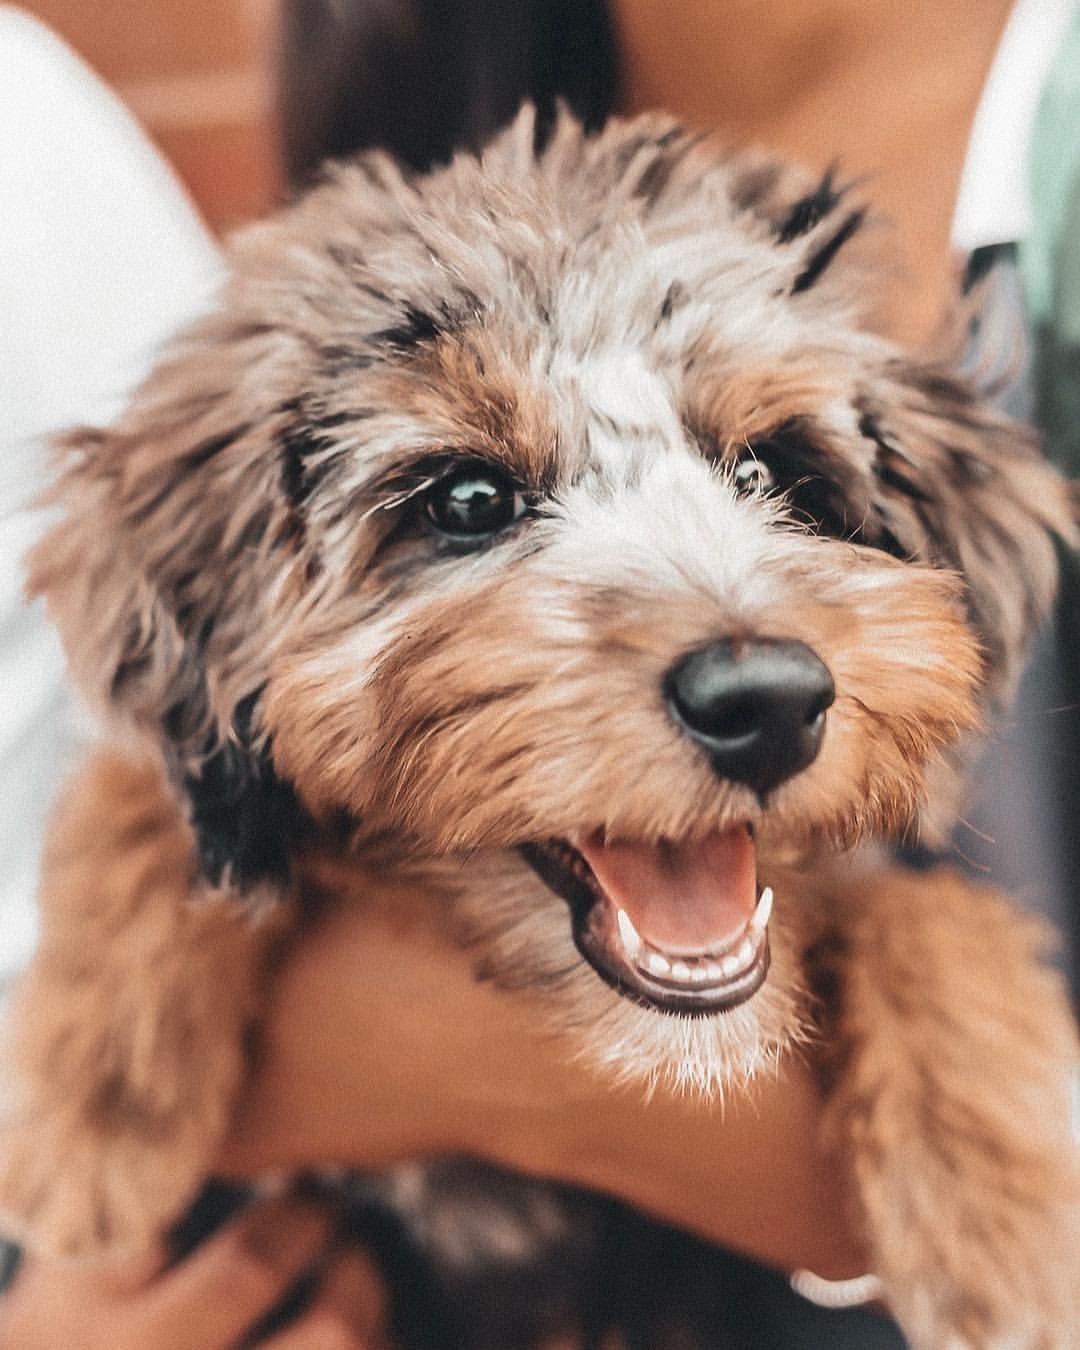 Theodore The Doggo On Instagram Is An Australian Shepherd Poodle